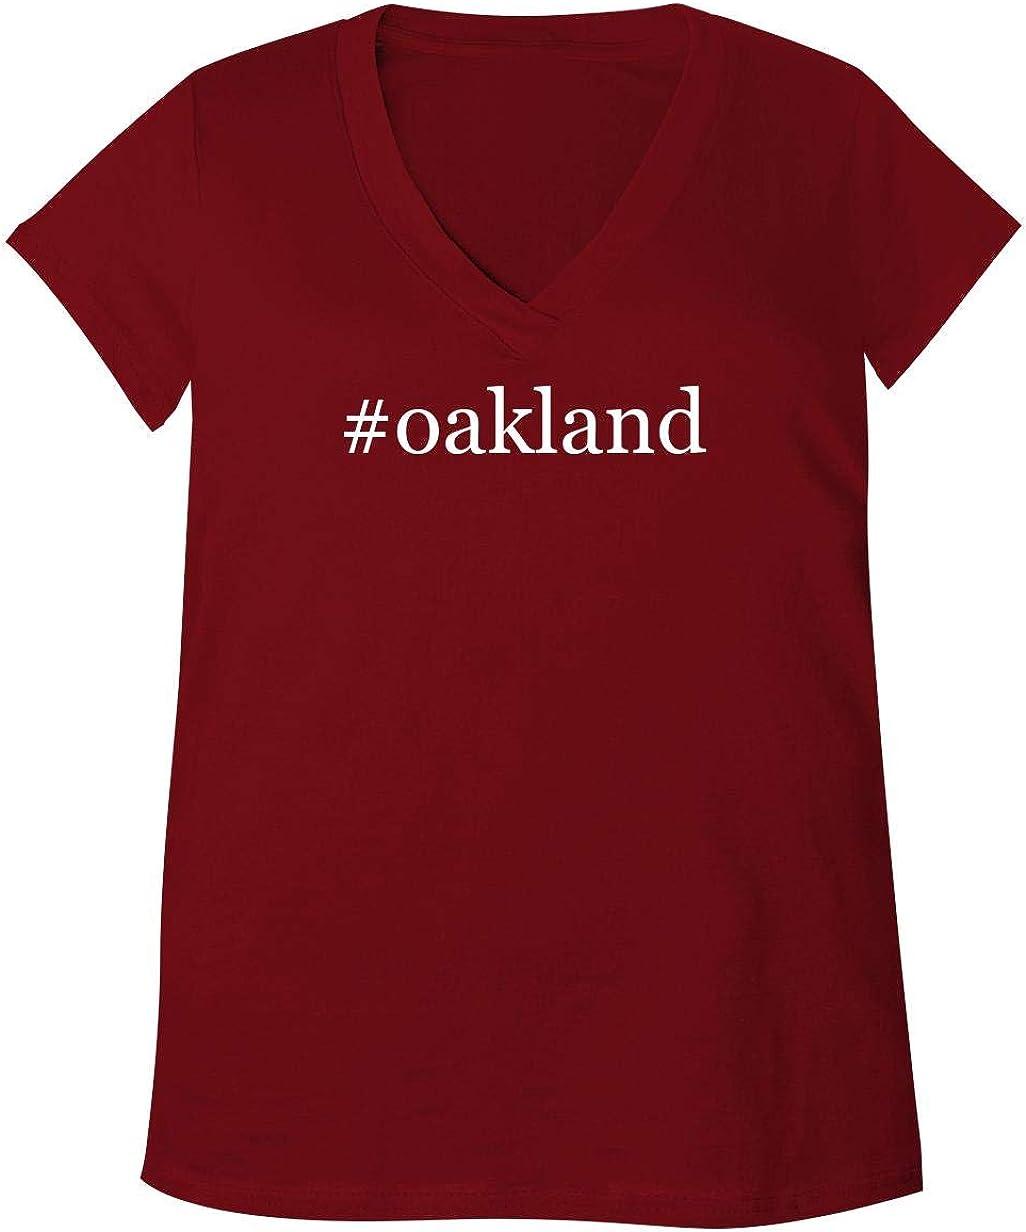 #Oakland - Adult Bella + Canvas B6035 Women's V-Neck T-Shirt 51DlEBk-xPL